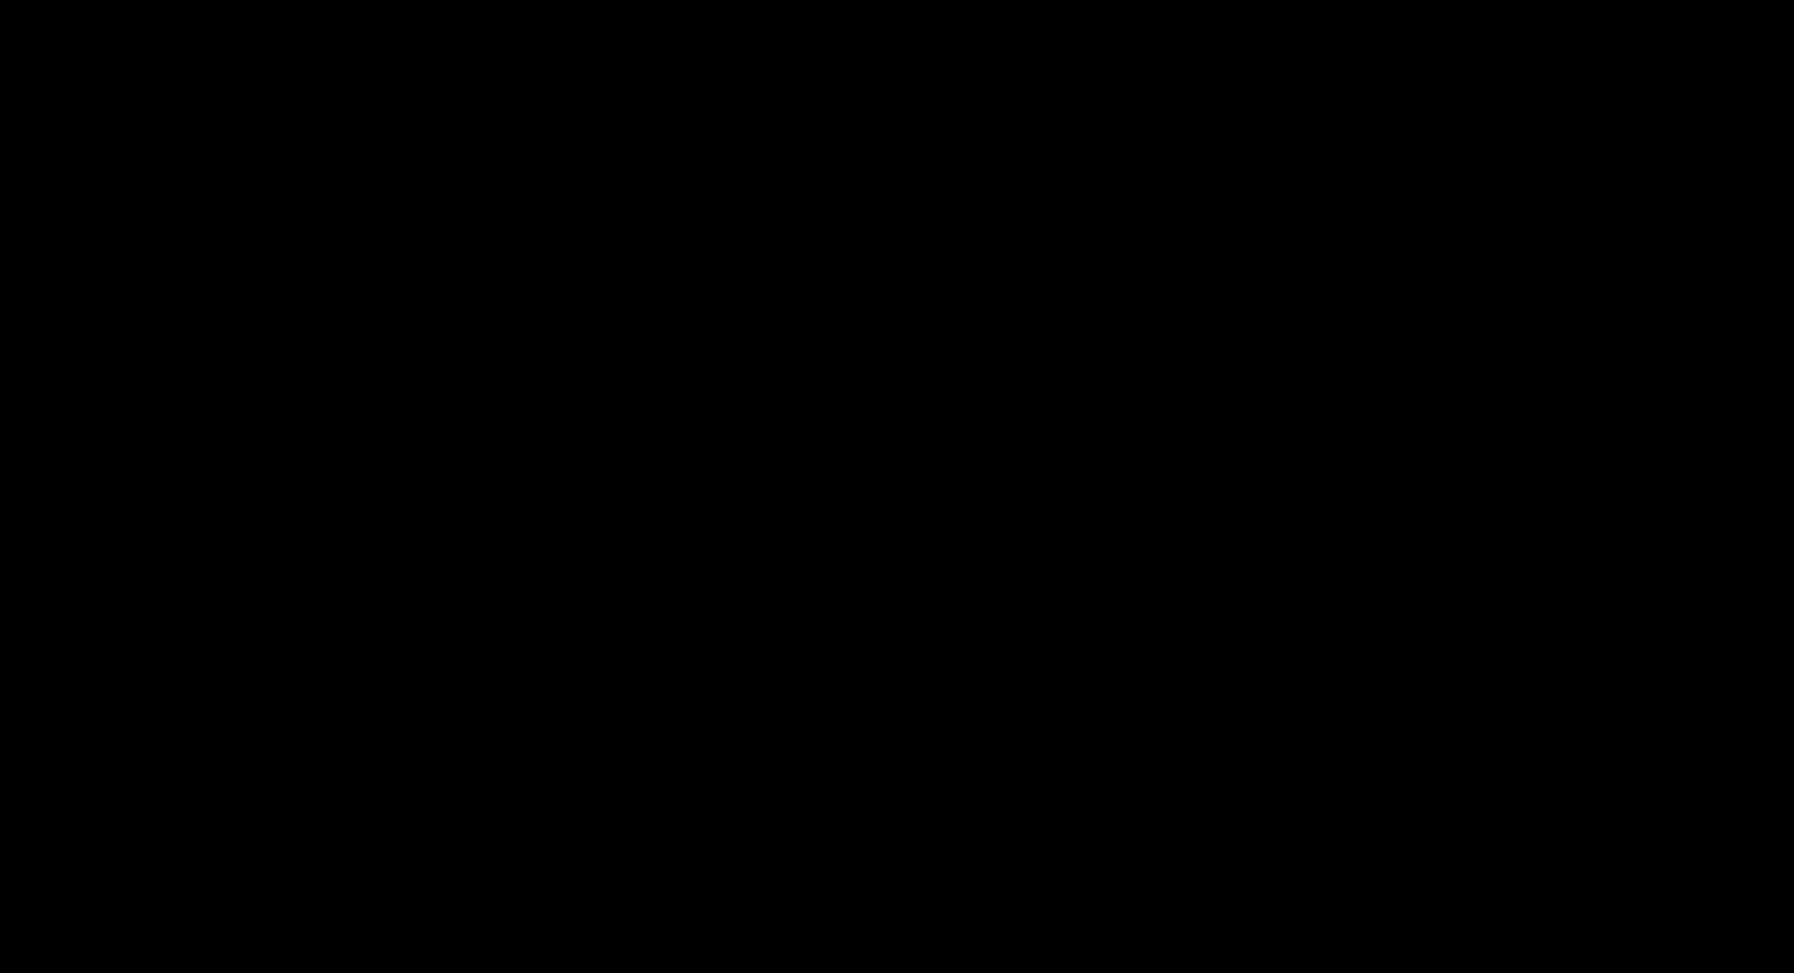 Linezolid Dimer